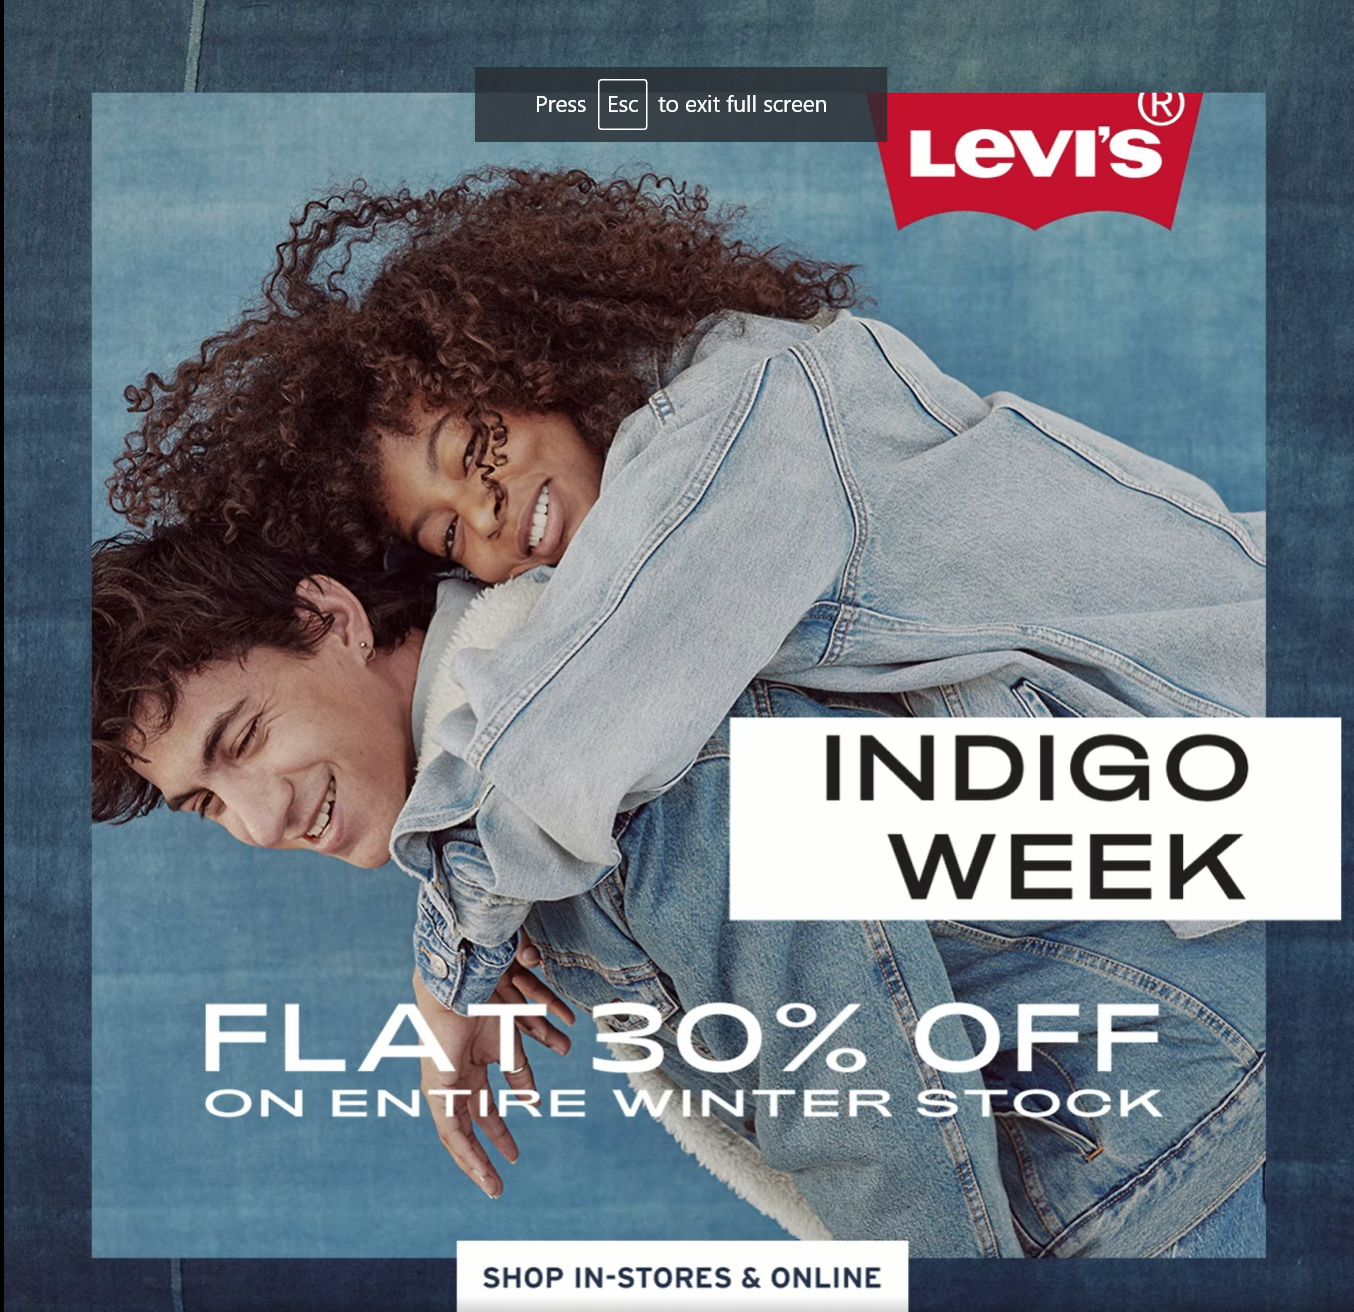 Levi's - Indigo Week Sale